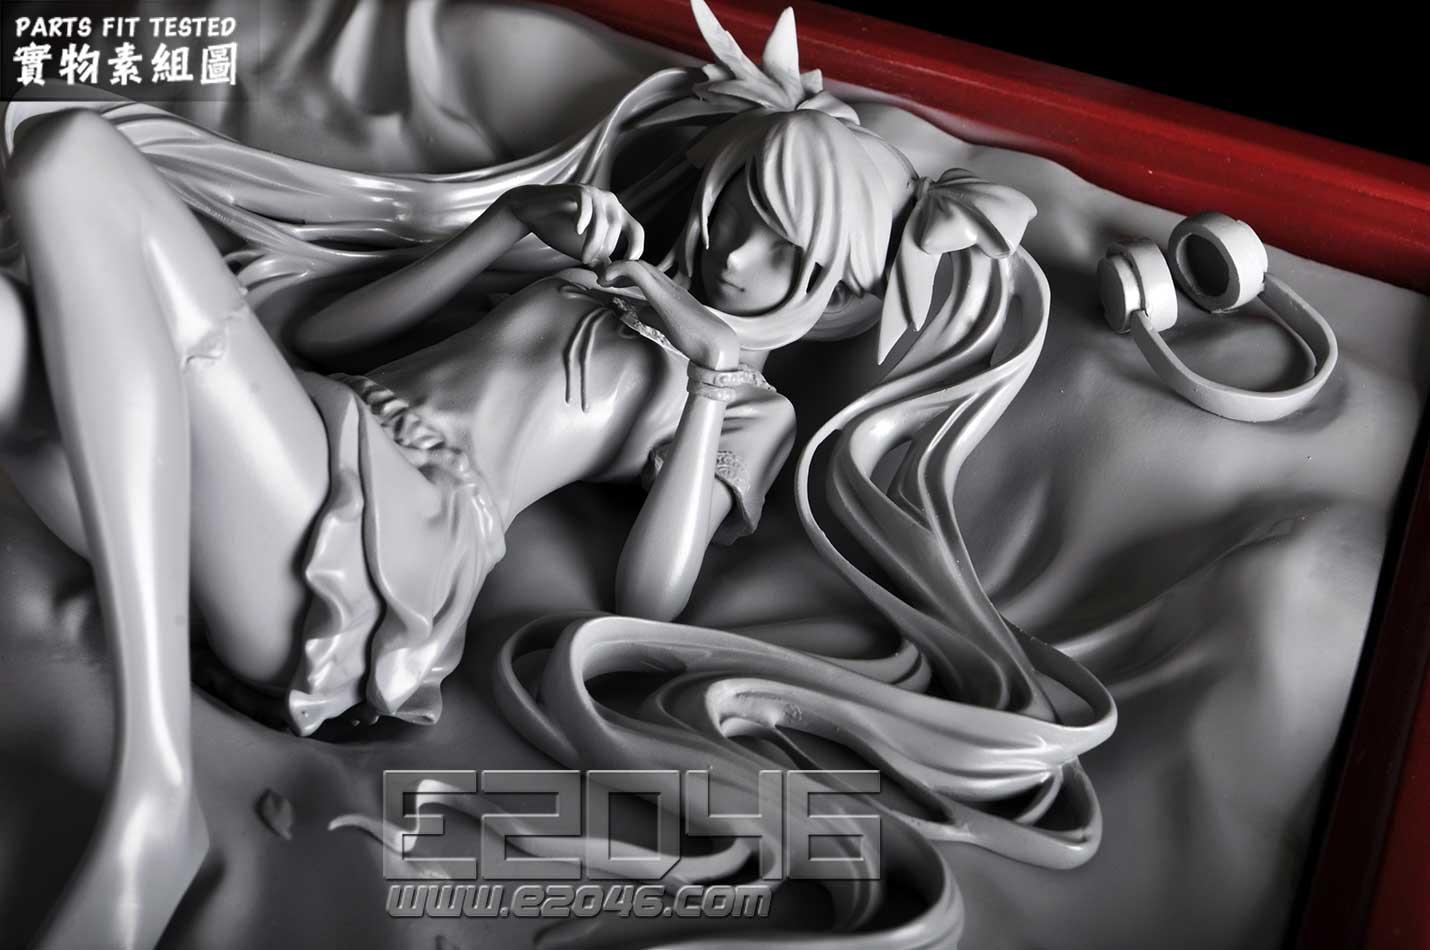 Miku Hatsune Frame Version